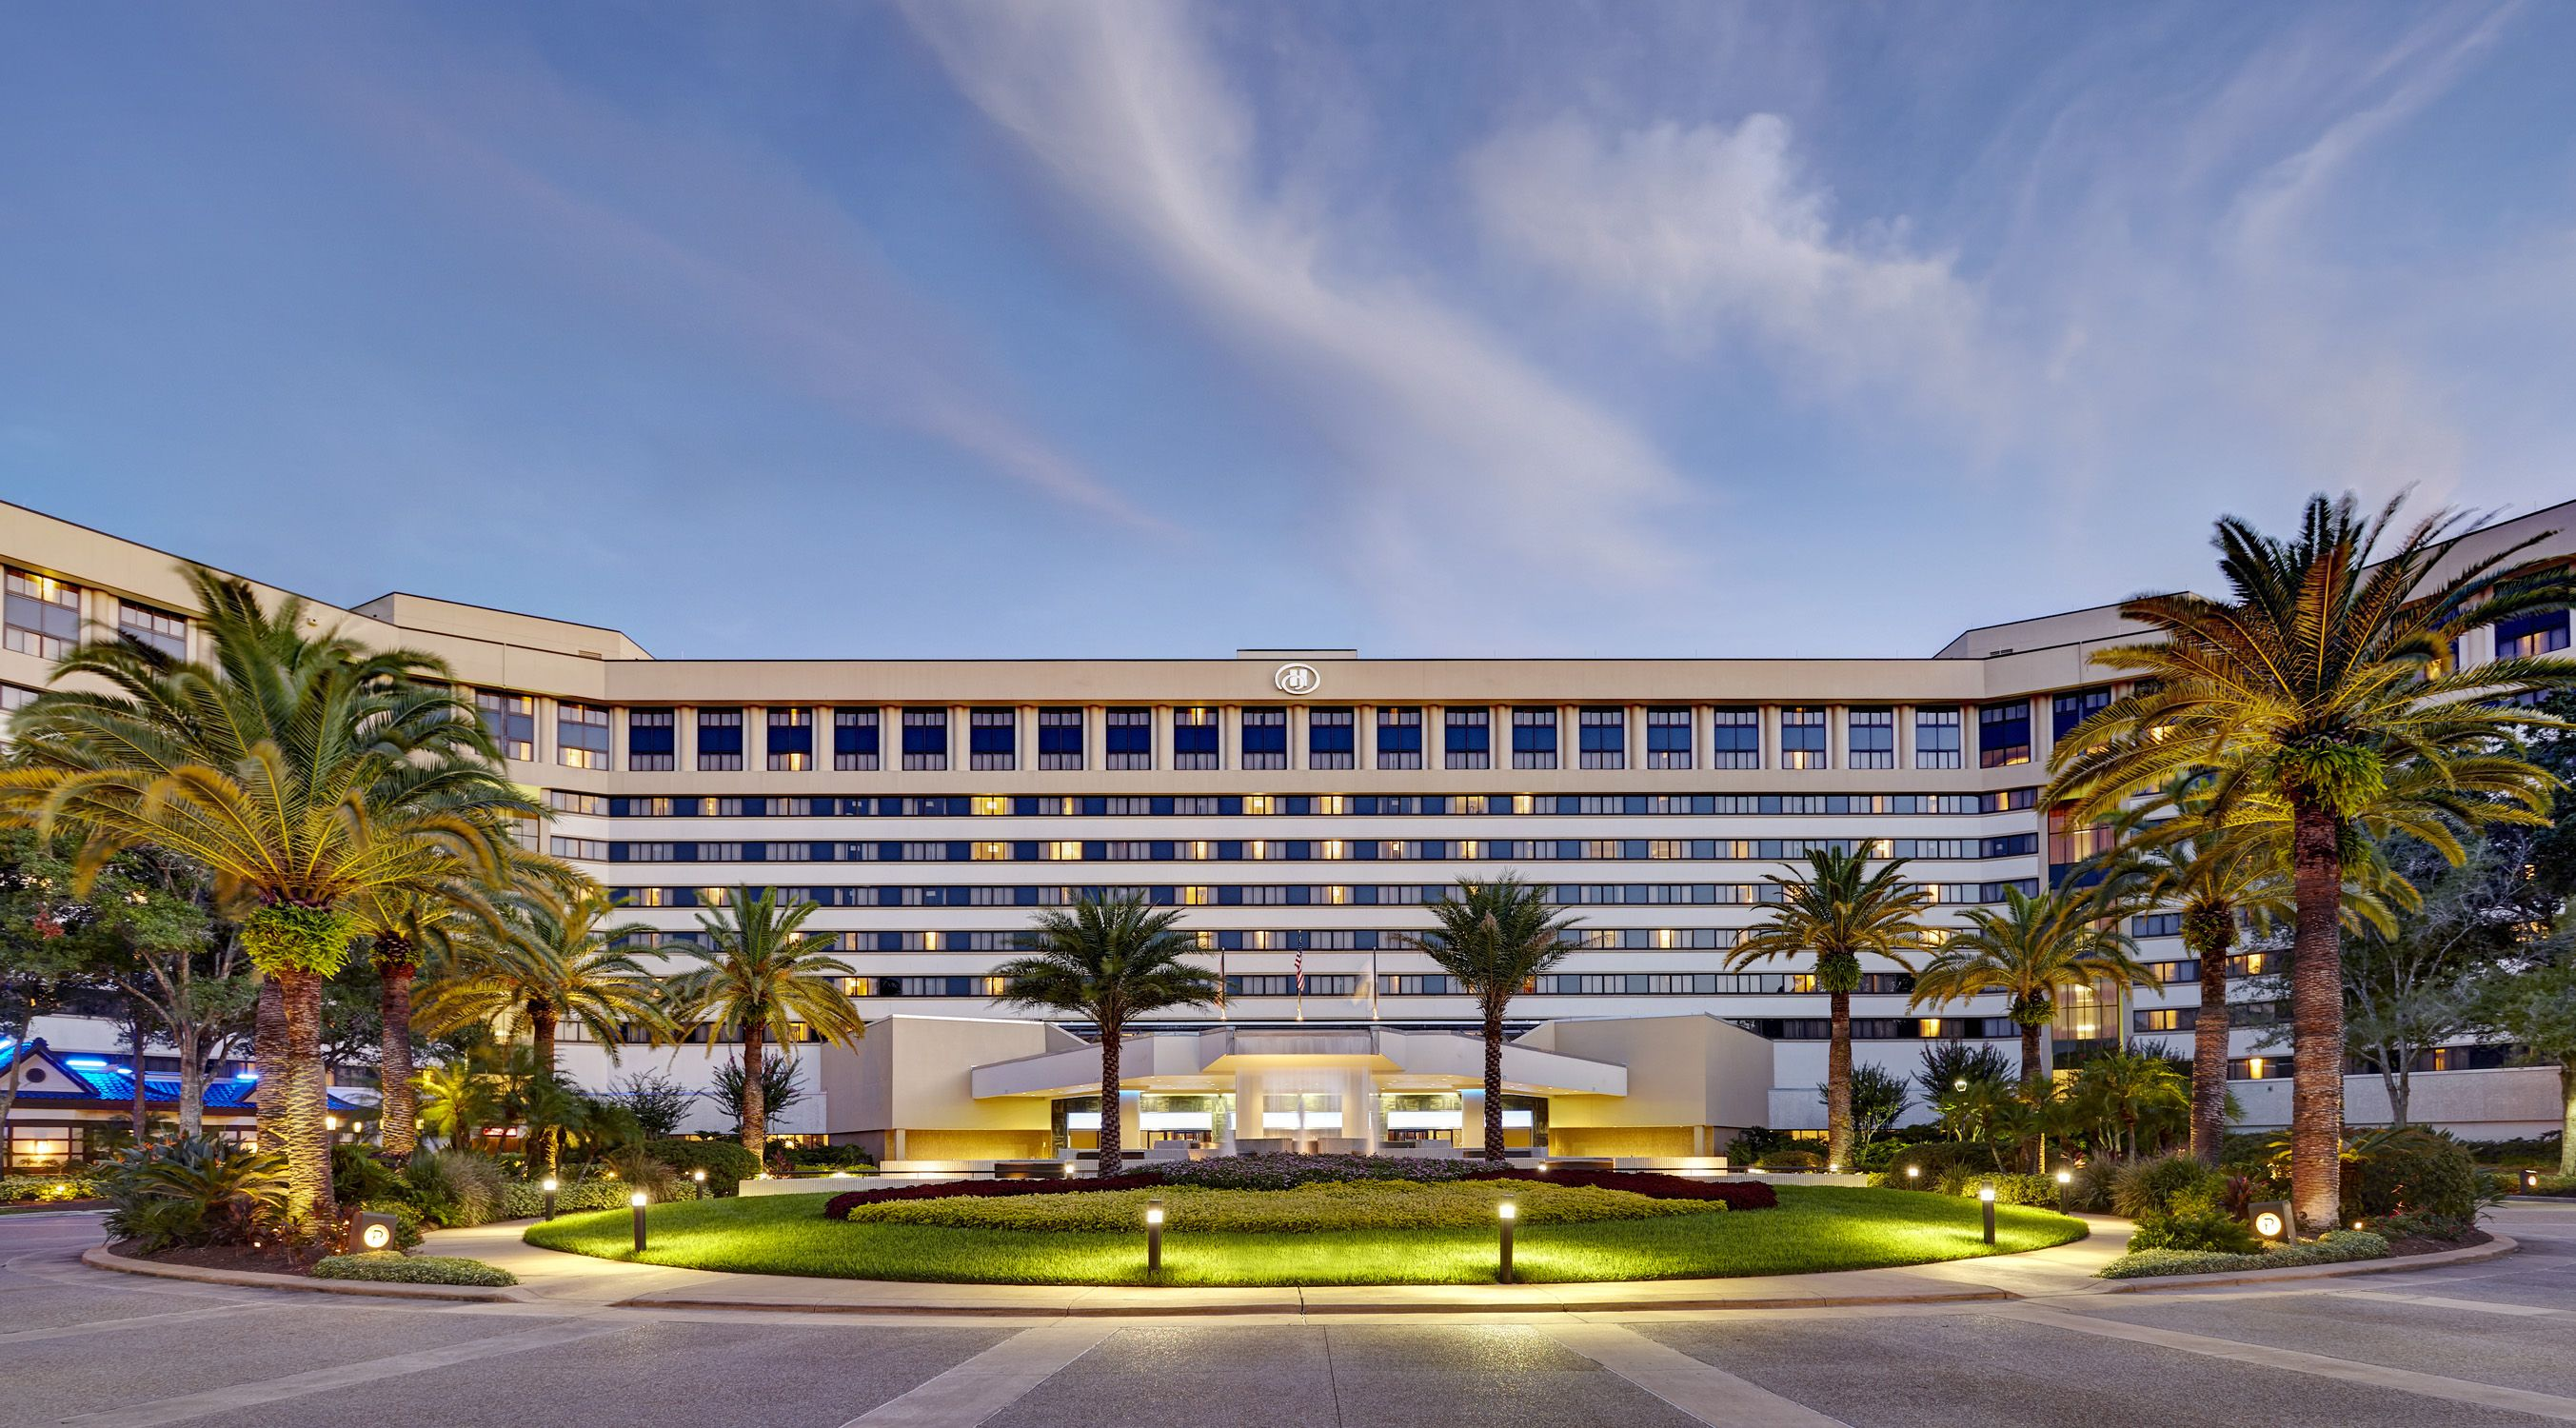 Hilton Orlando Lake Buena Vista The Only Hilton Hotel With Disney